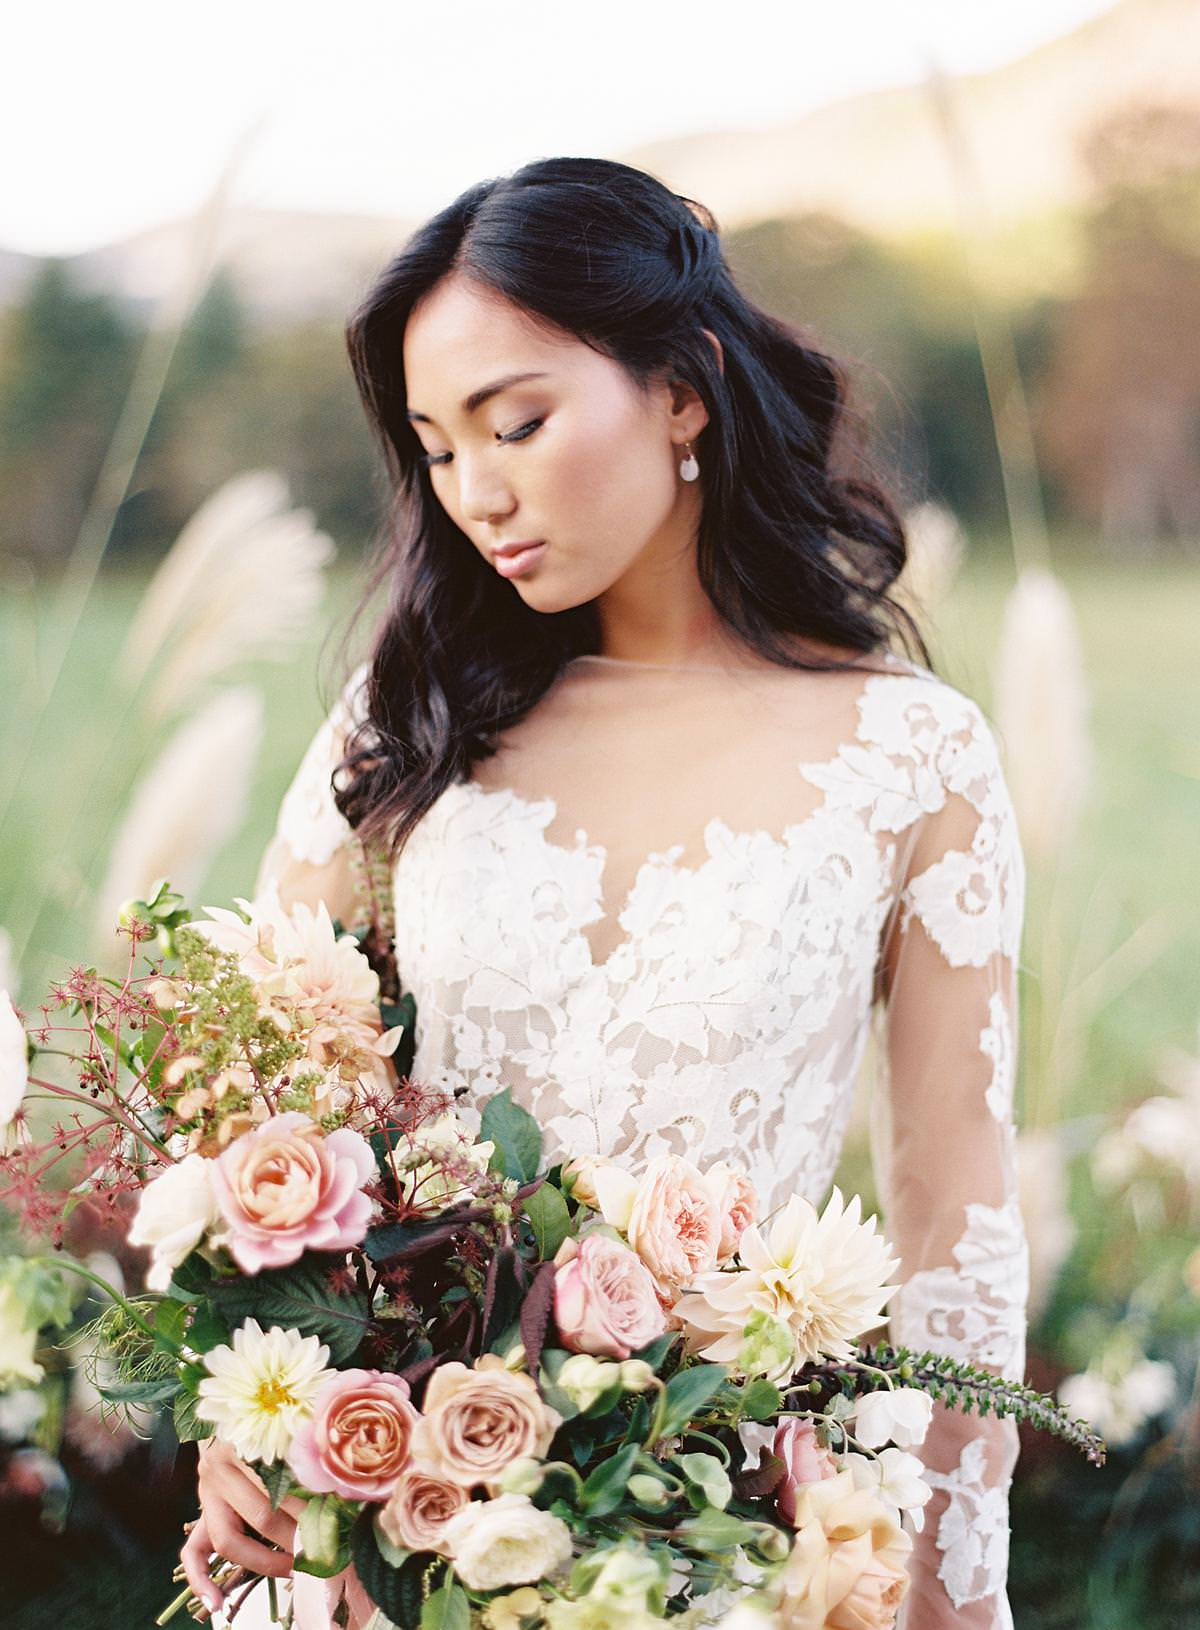 modfete wedding bouquet